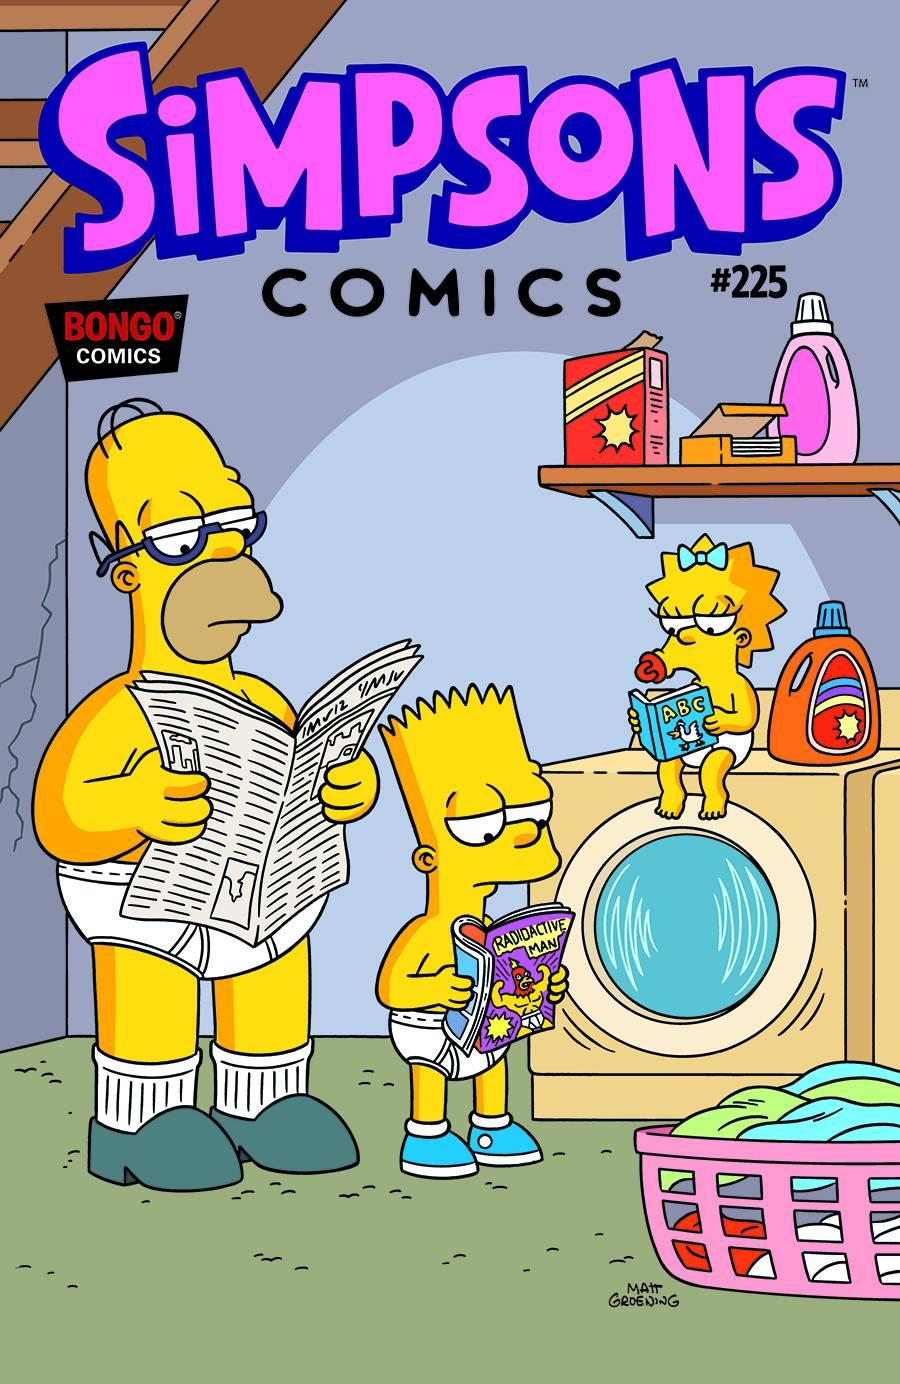 Simpsons Comics 225.jpg